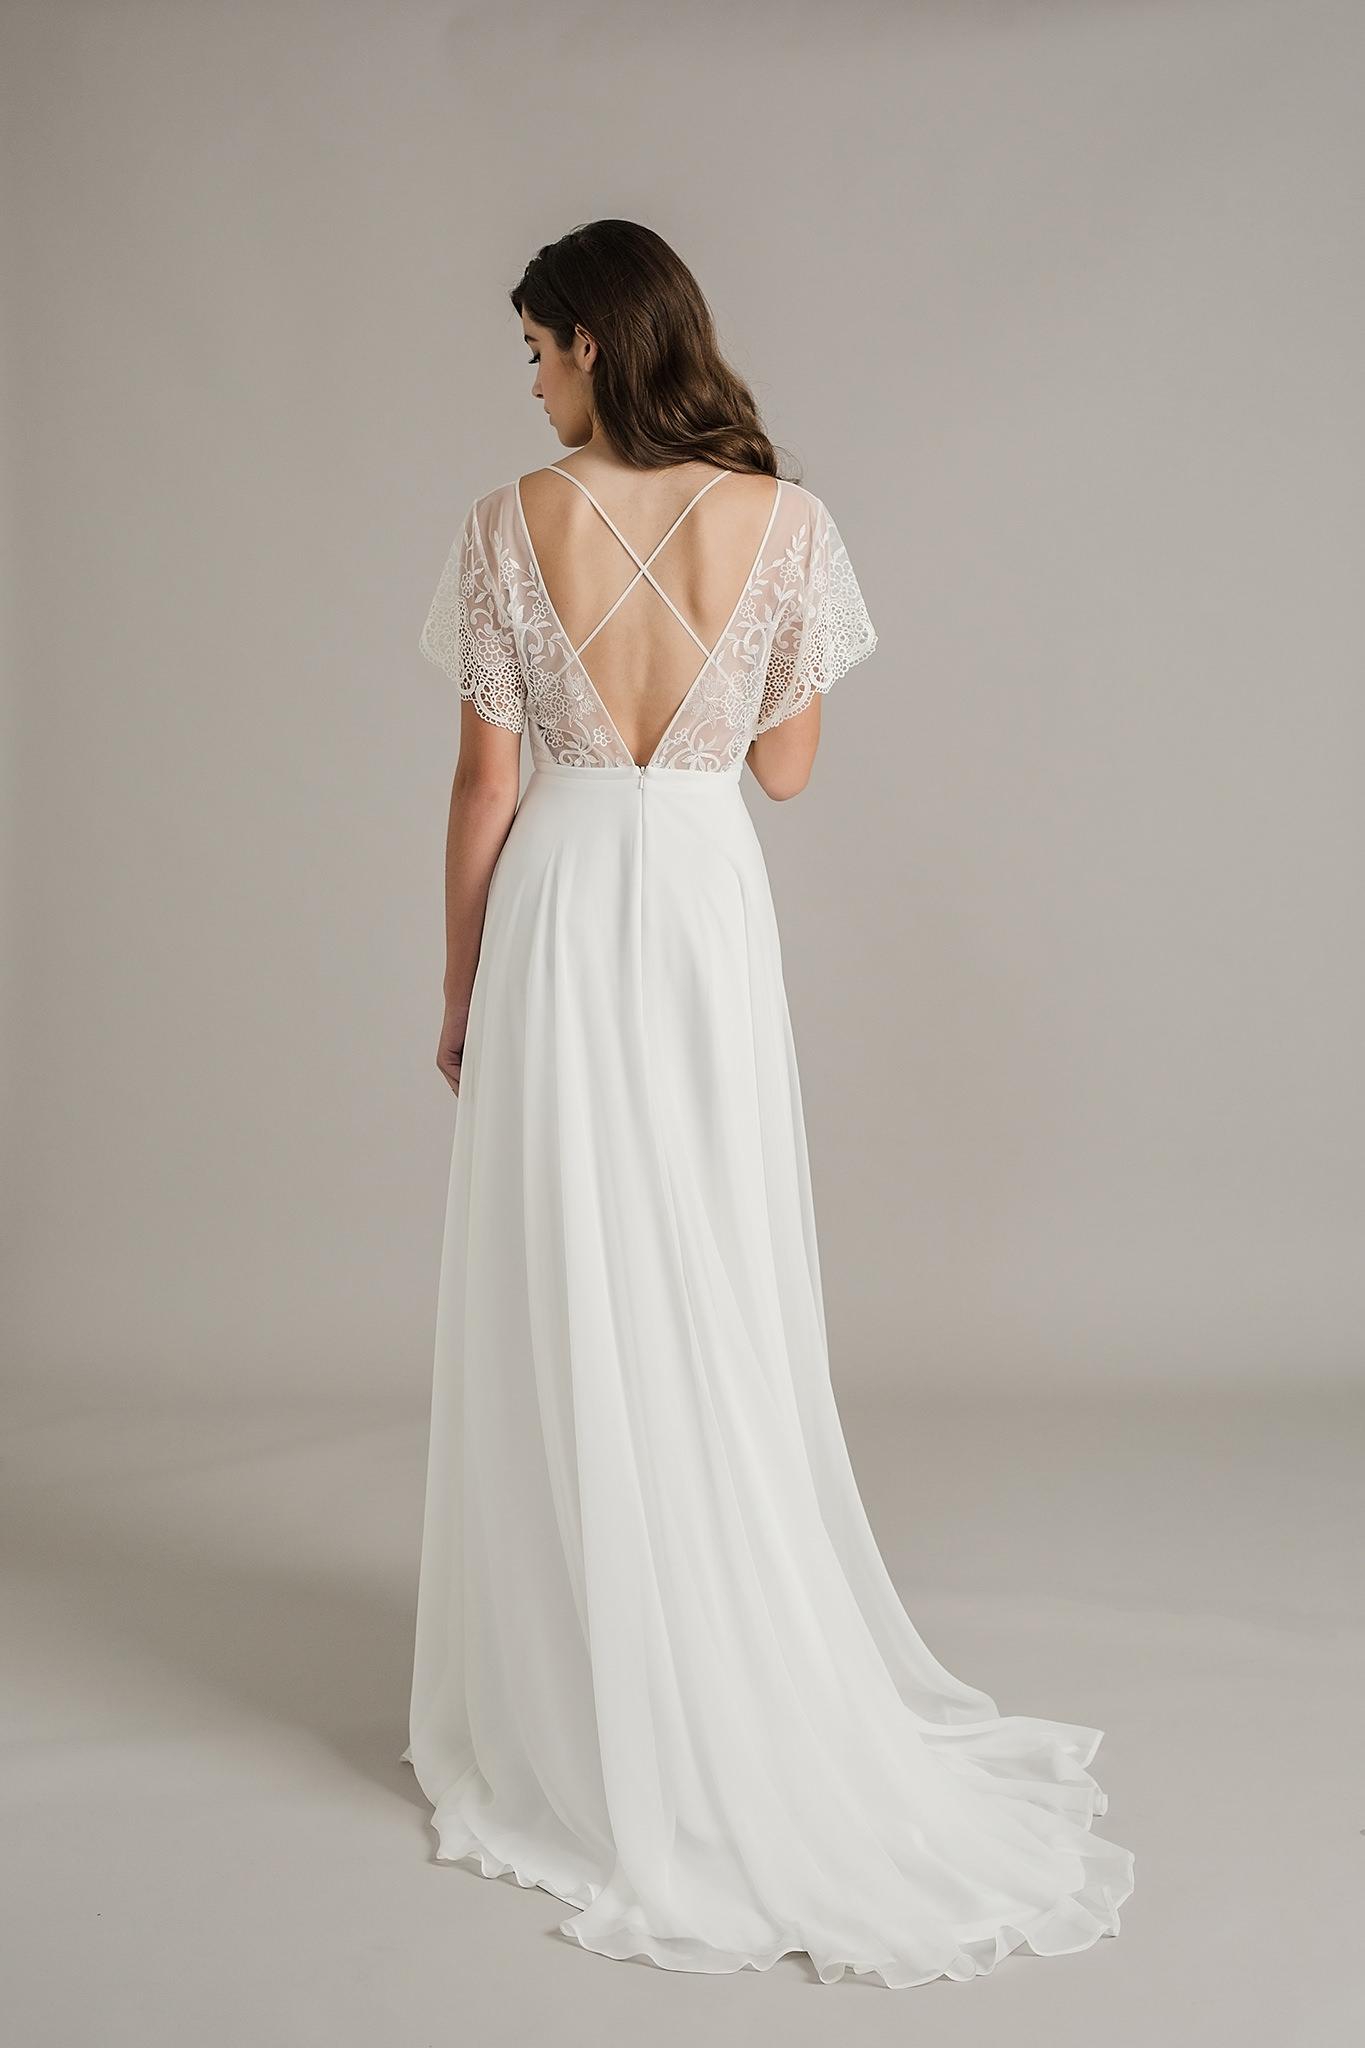 Julia wedding dress by Sally Eagle